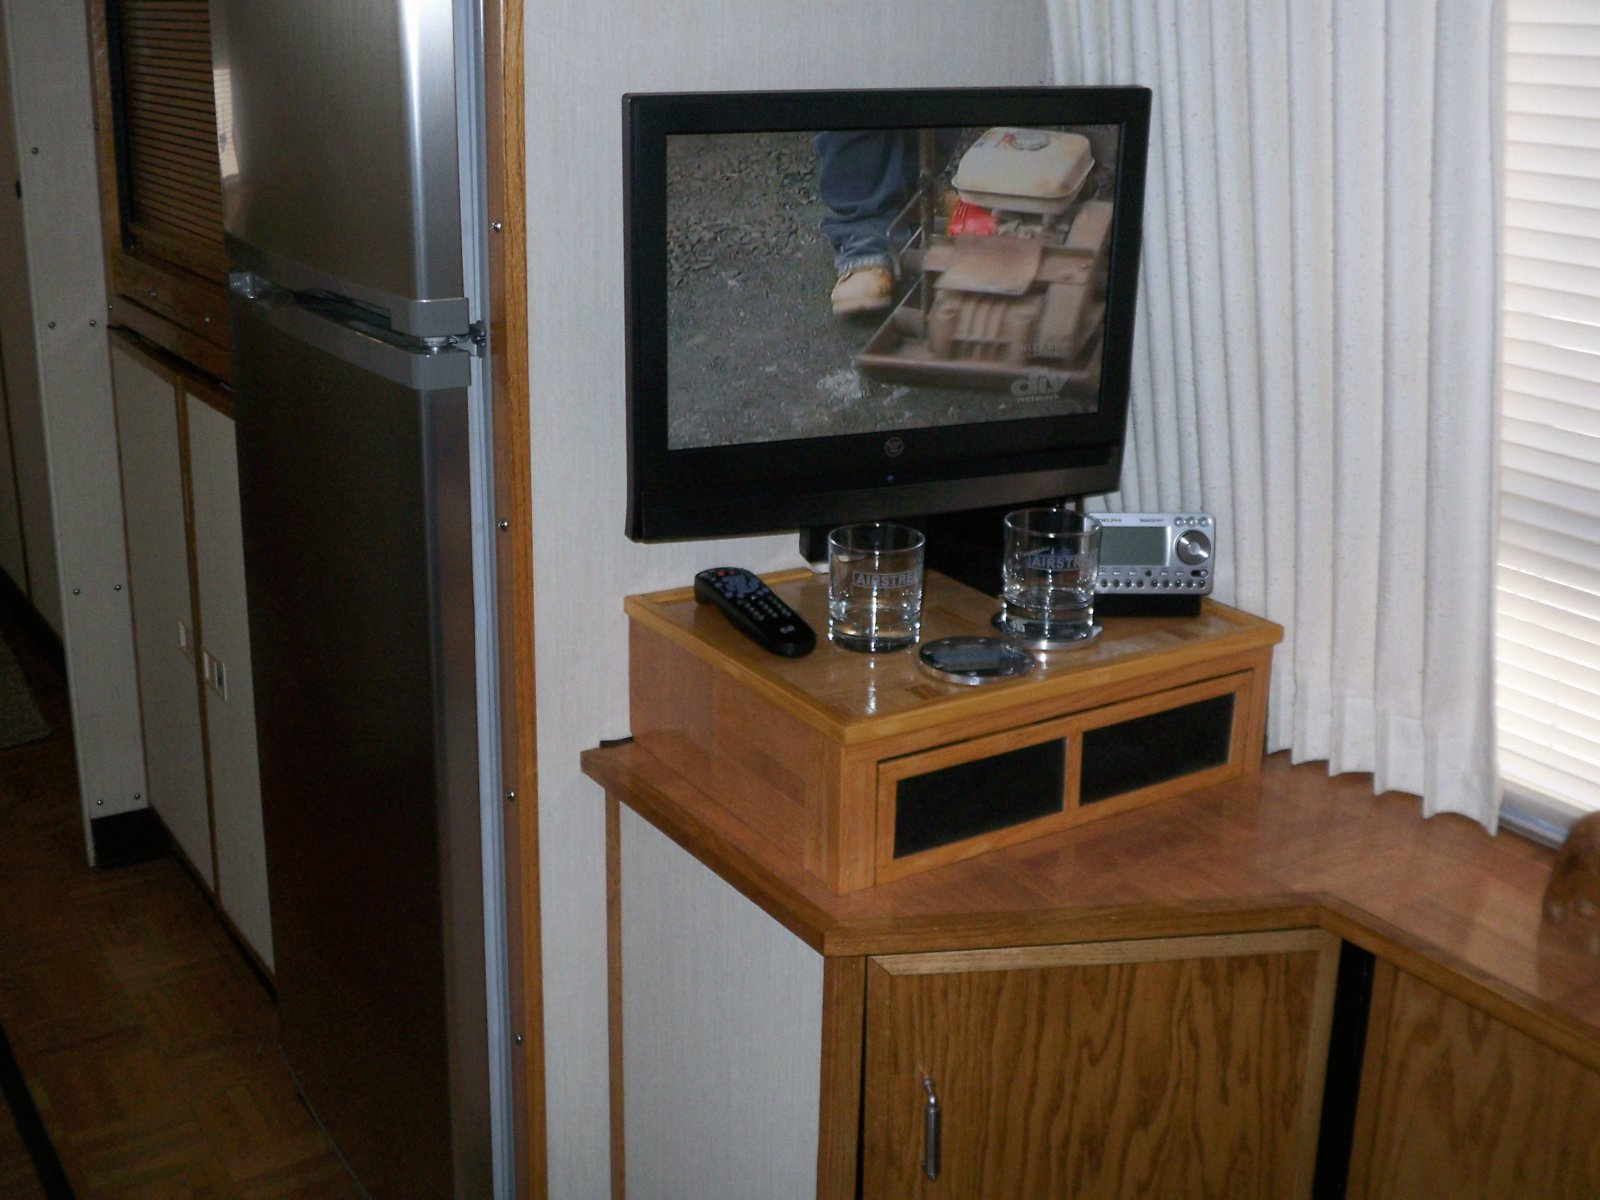 Click image for larger version  Name:TV-setup1.jpg Views:54 Size:241.6 KB ID:100617